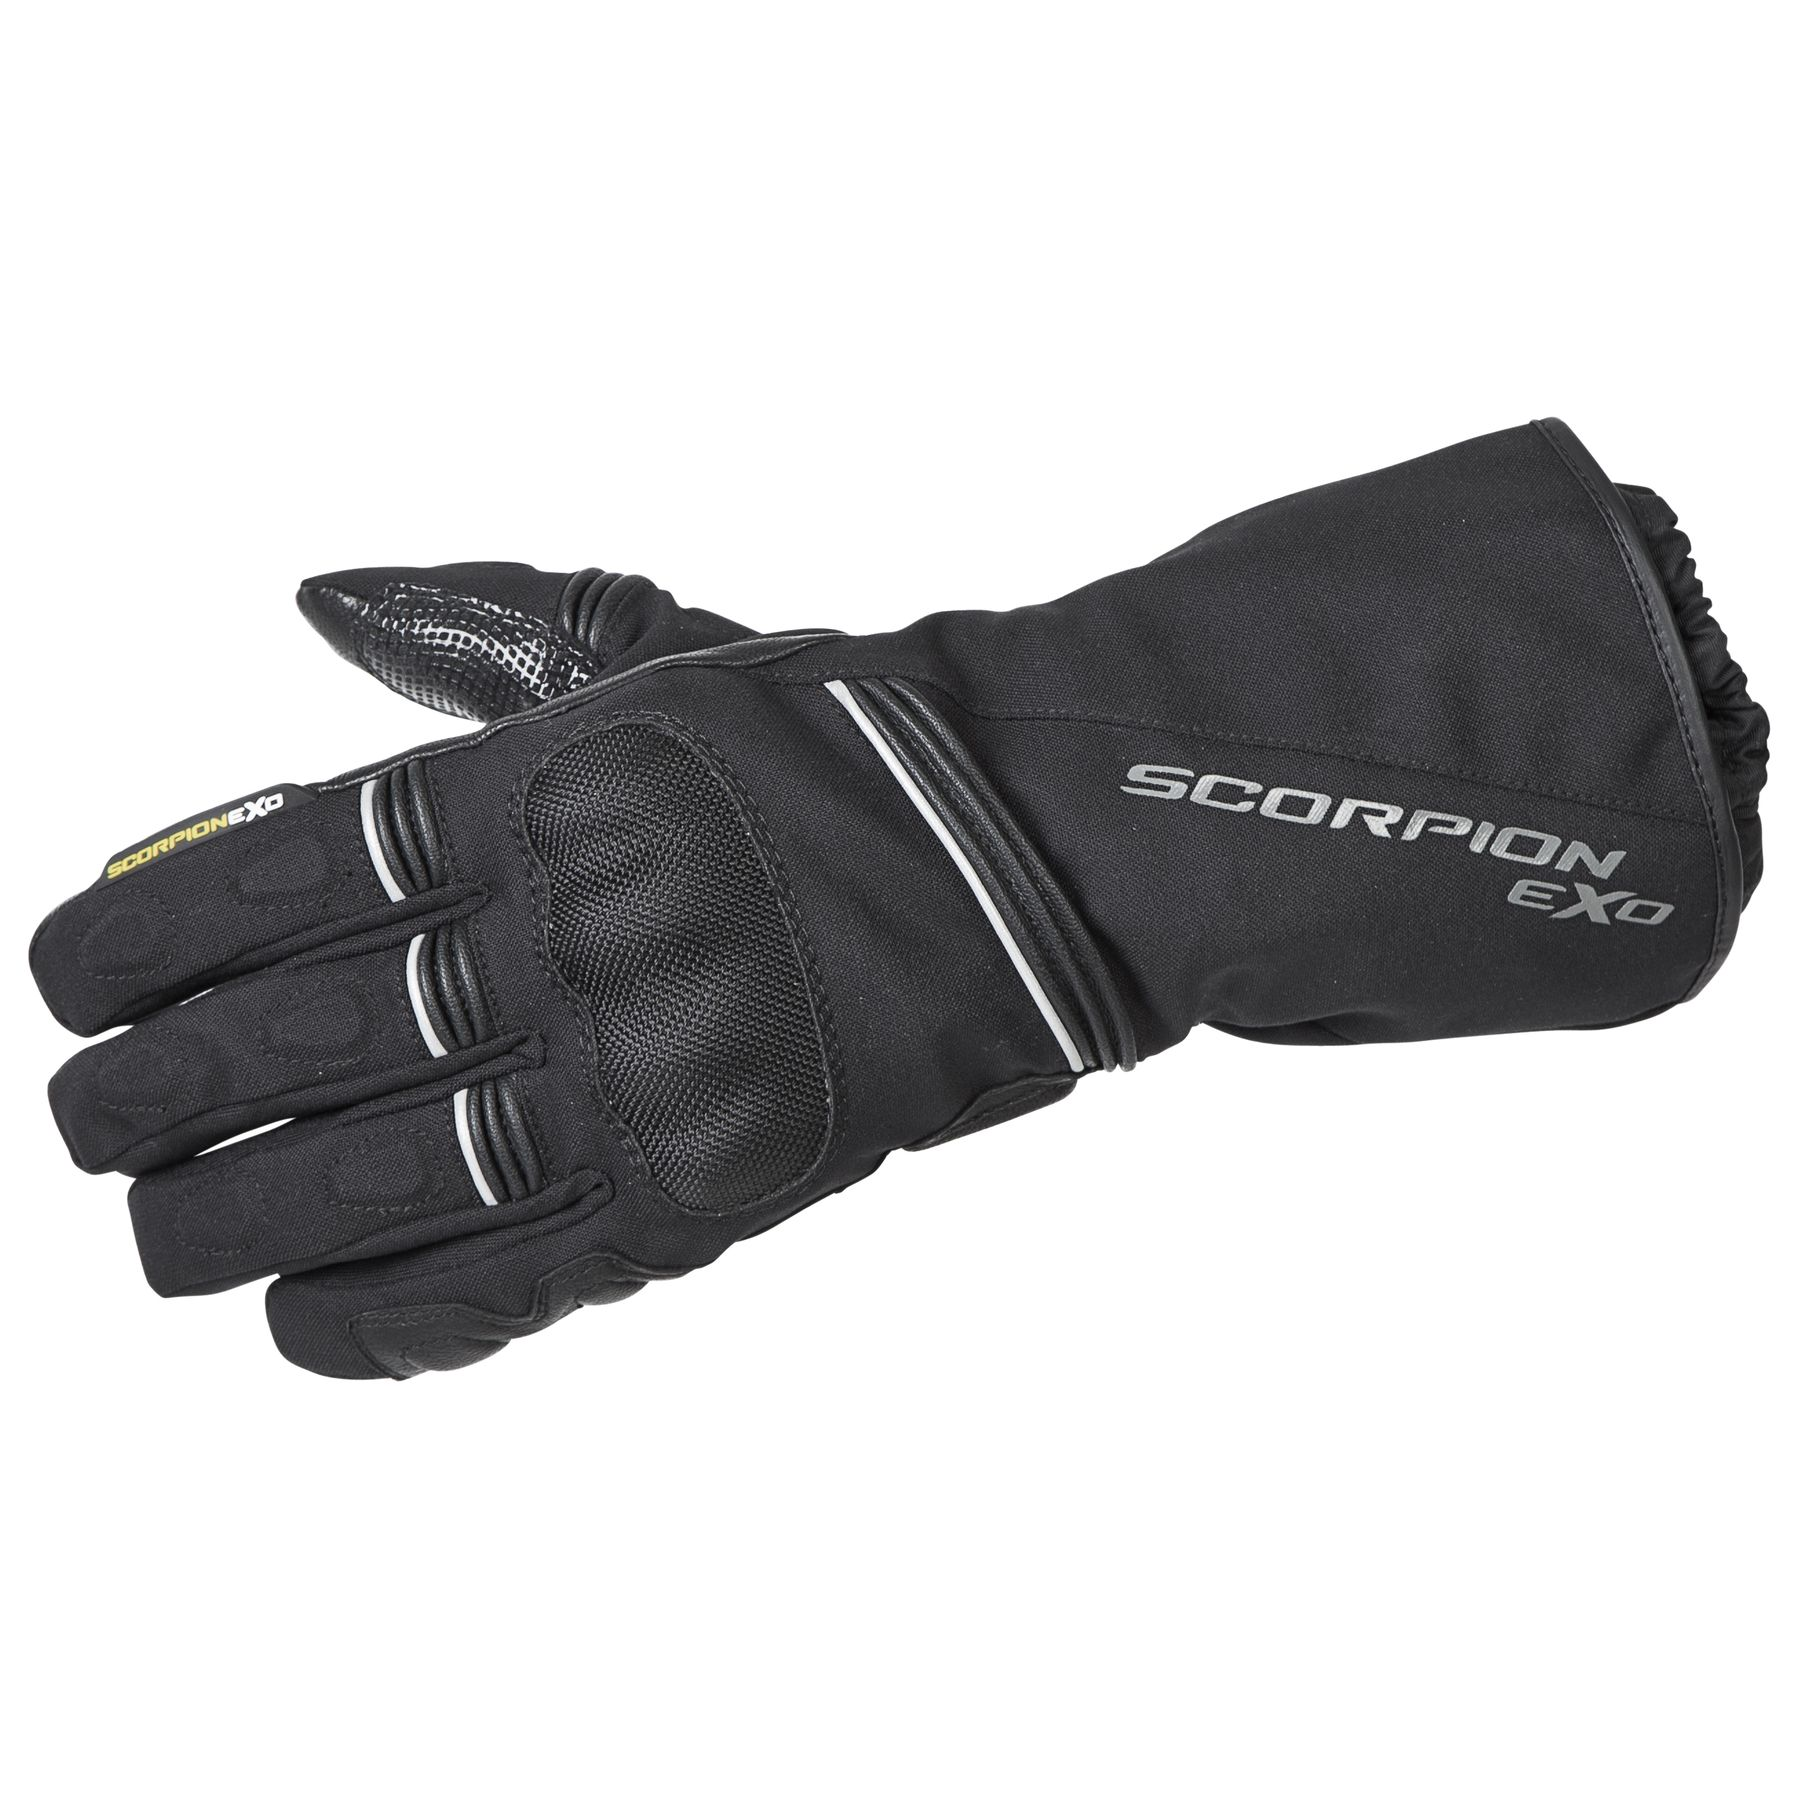 Scorpion Tempest Gloves